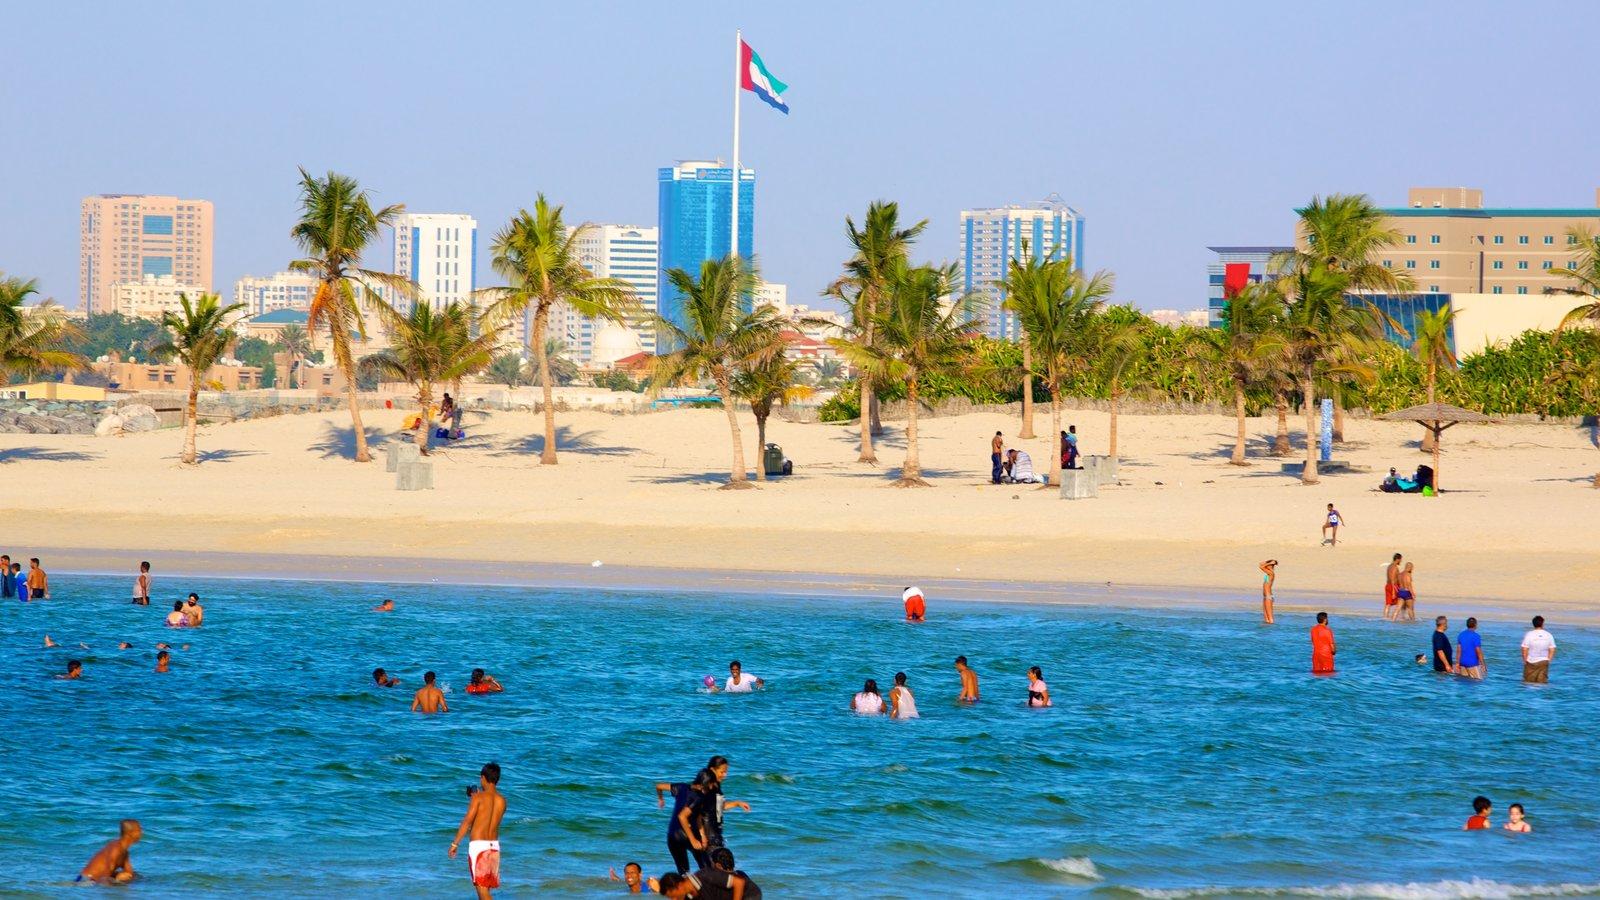 Al Mamzar Beach Park featuring a beach, swimming and tropical scenes